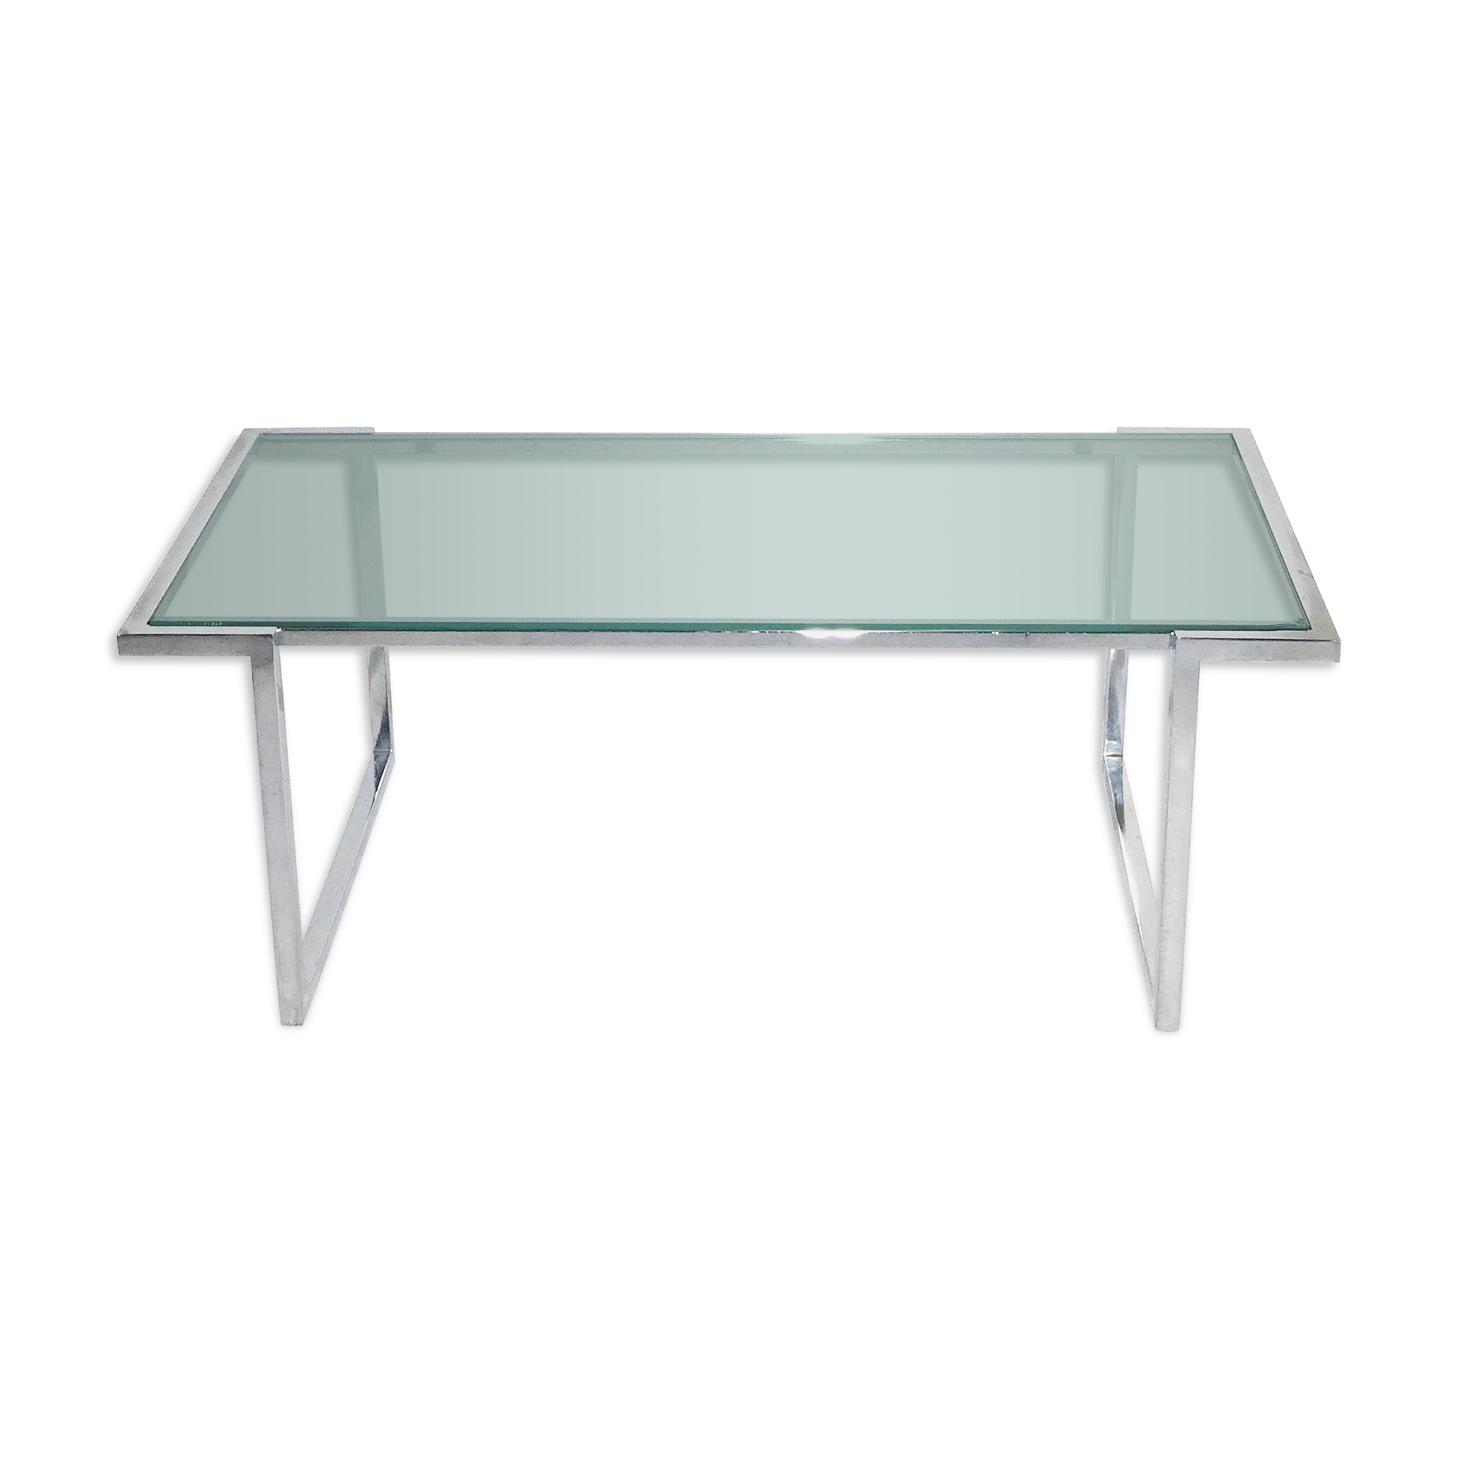 Table basse vintage - aluminium et verre - 1980